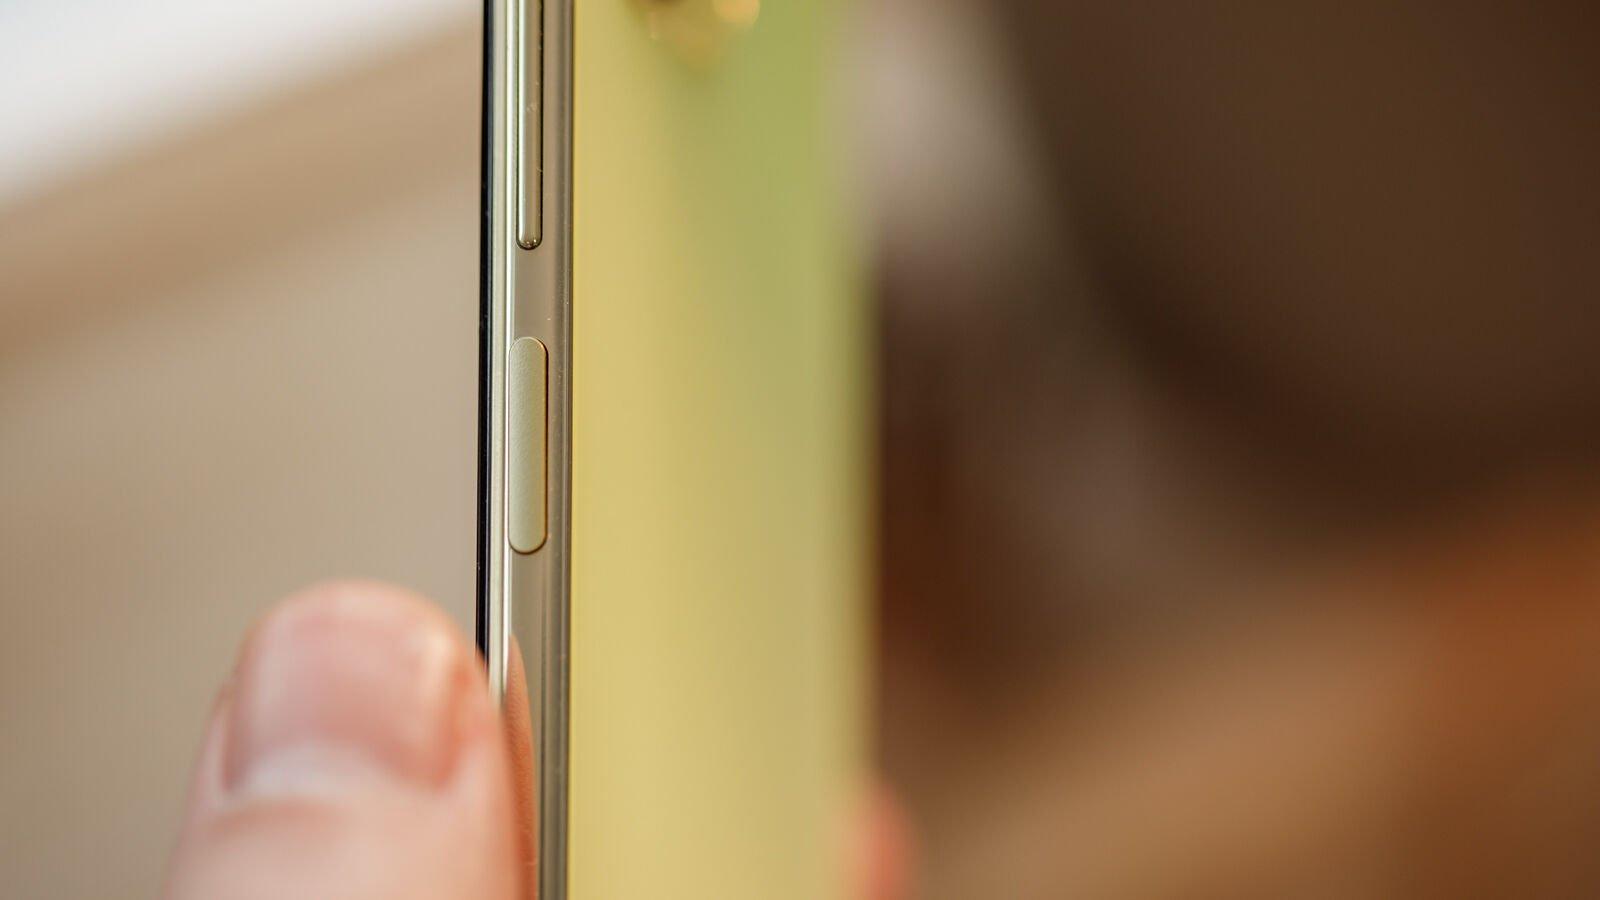 Xiaomi Mi 11 Lite 5G fingerprint sensor